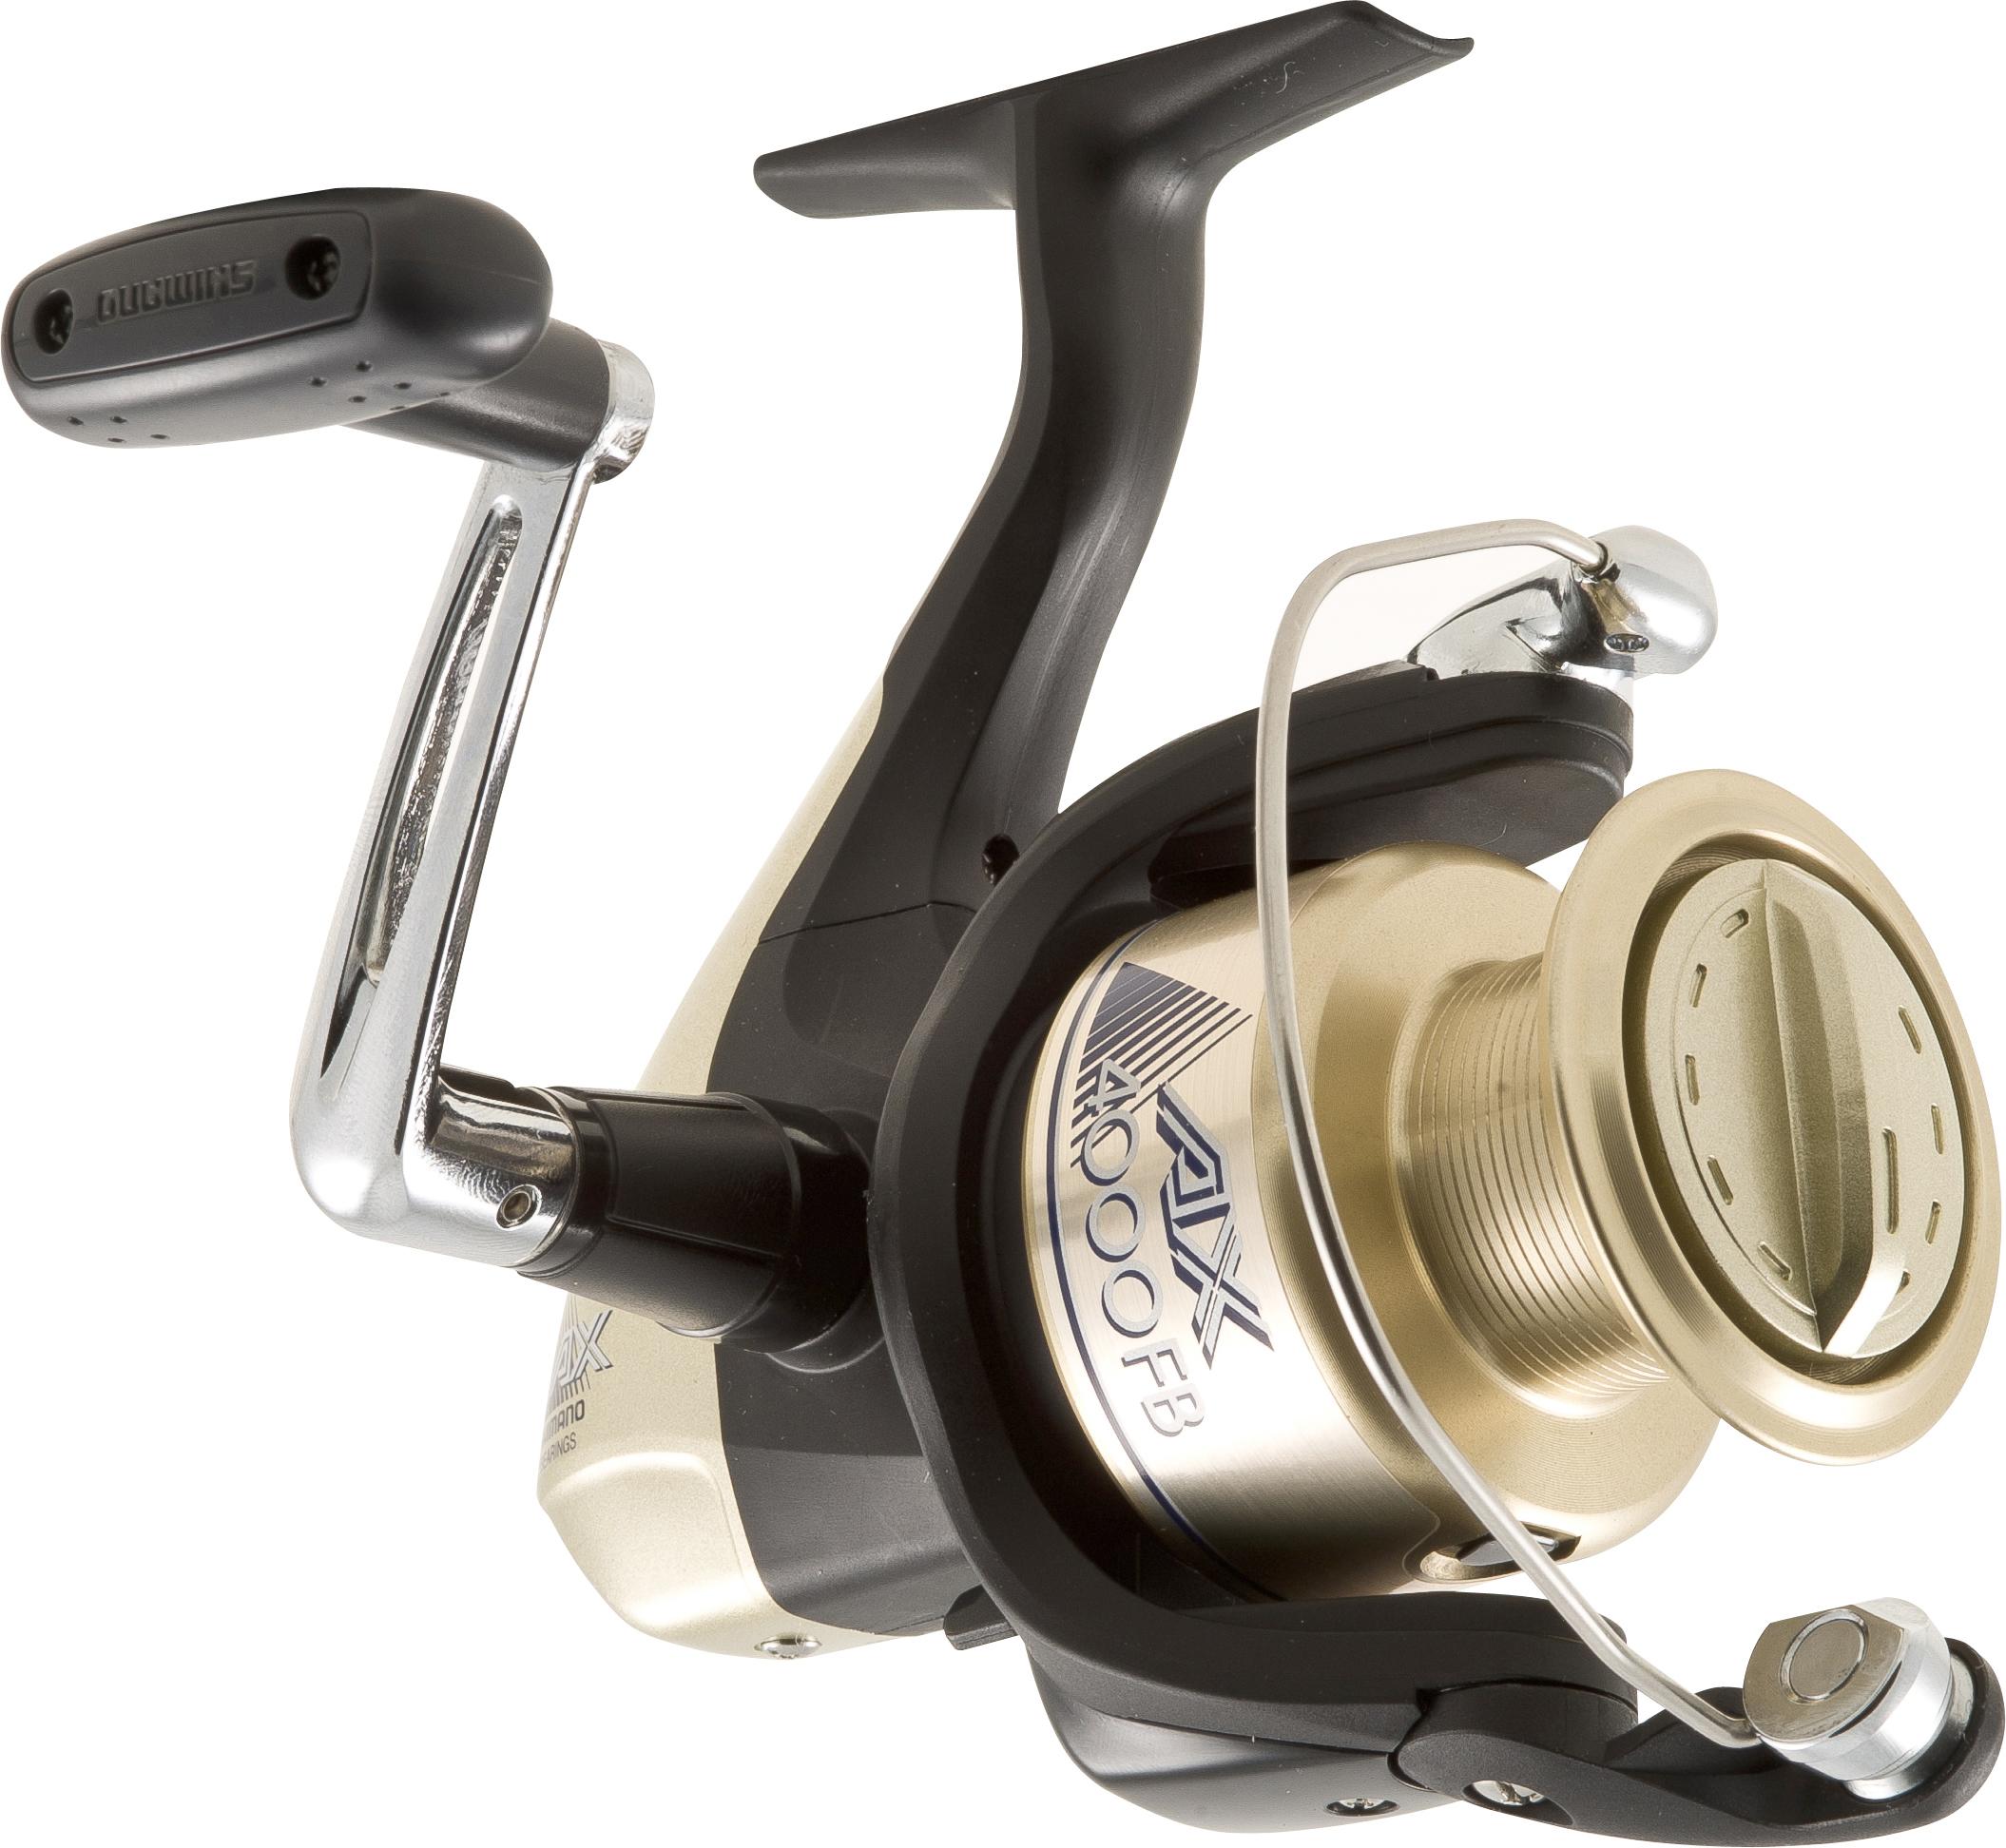 Máy câu cá Shimano AX 4000 FB BH 3 Tháng